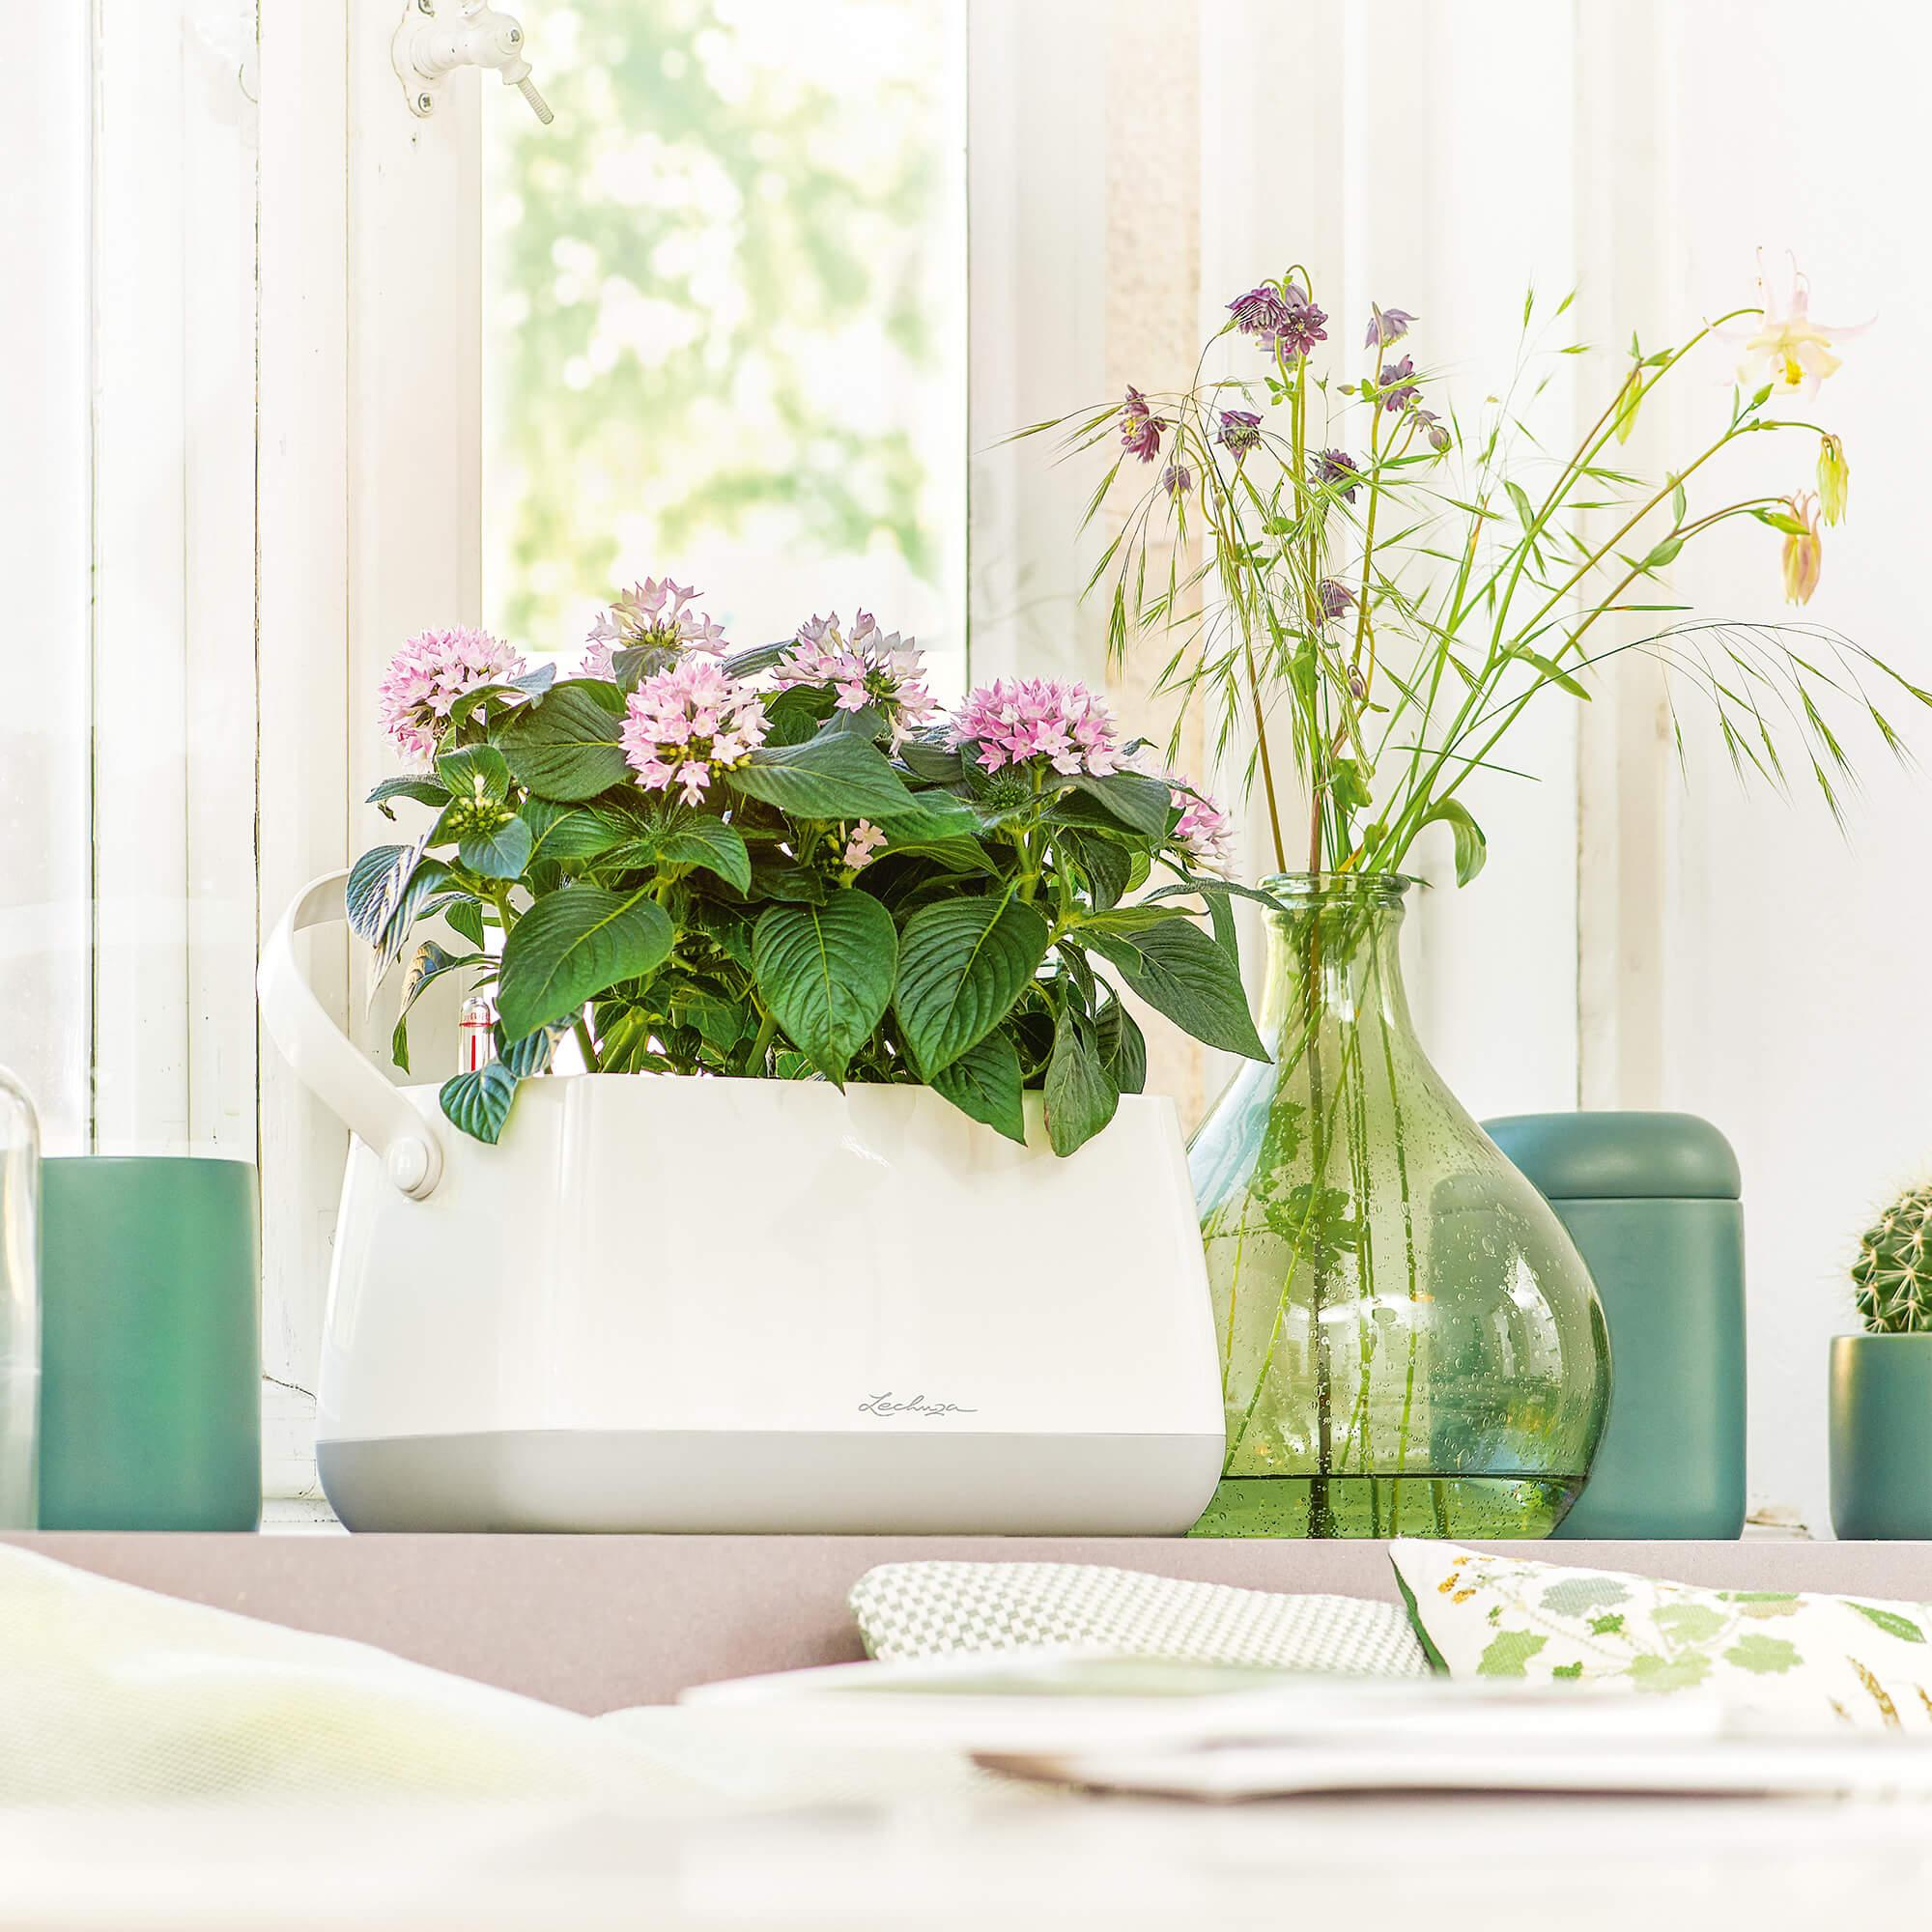 Jardinière YULA blanc/gris satiné - Image 5